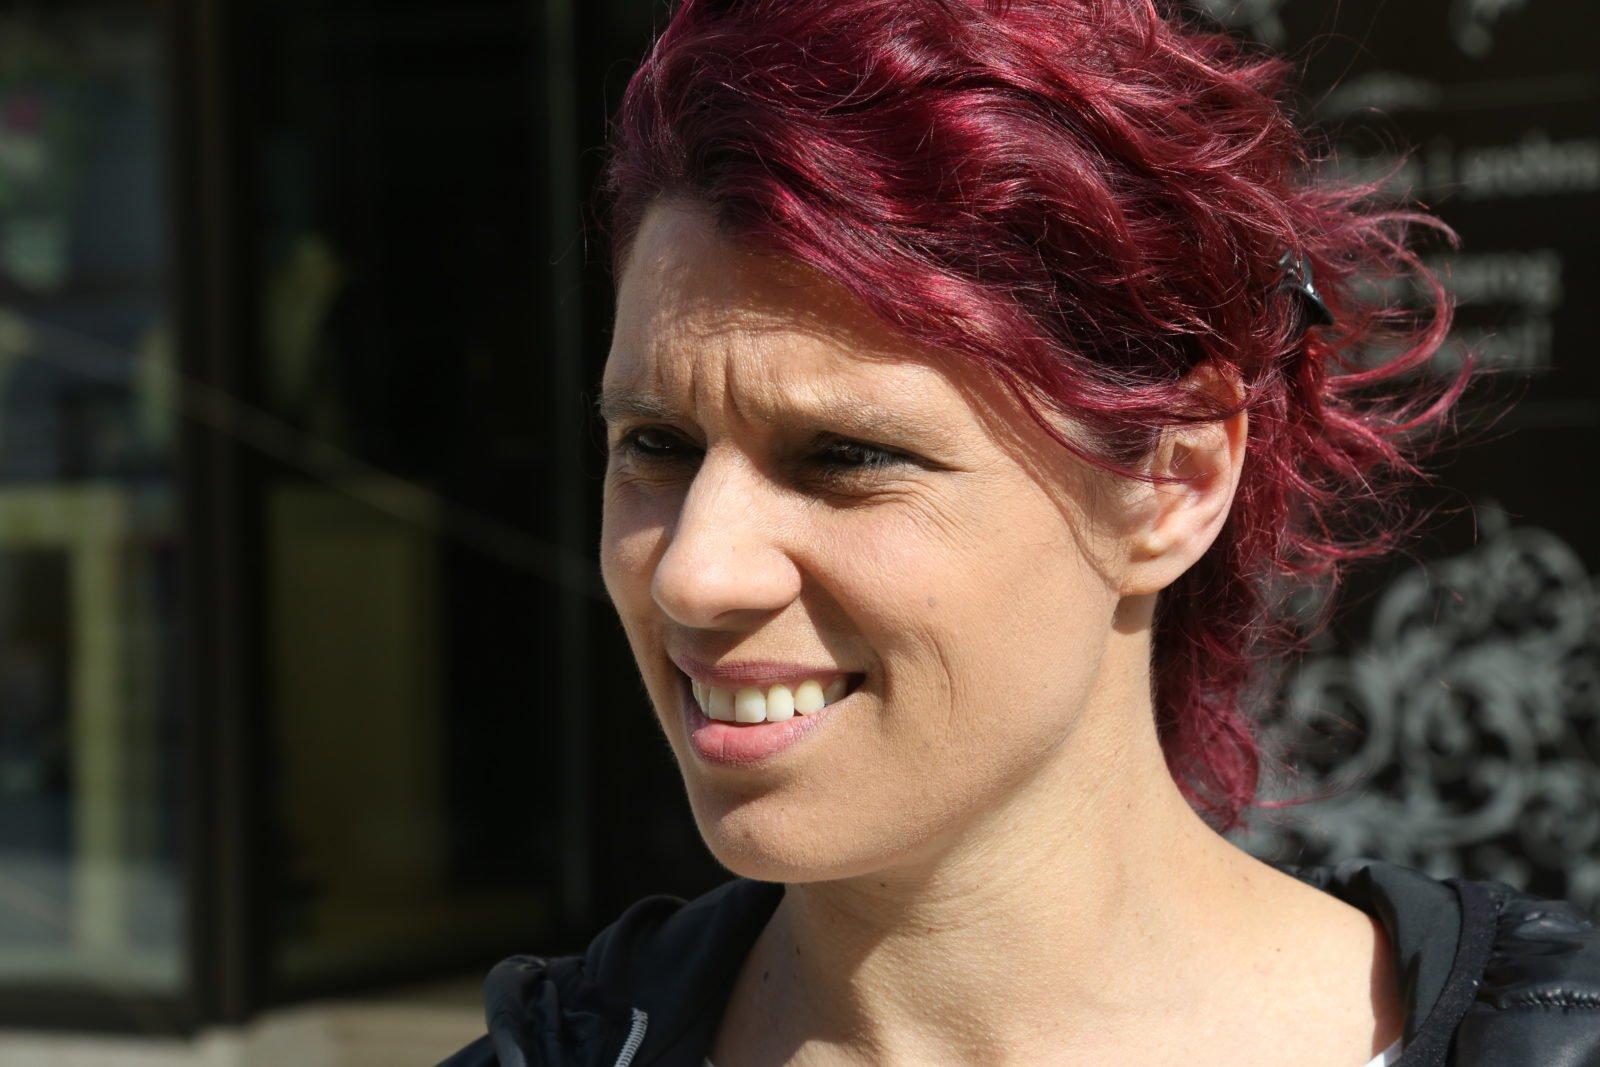 Tamara Krnjak